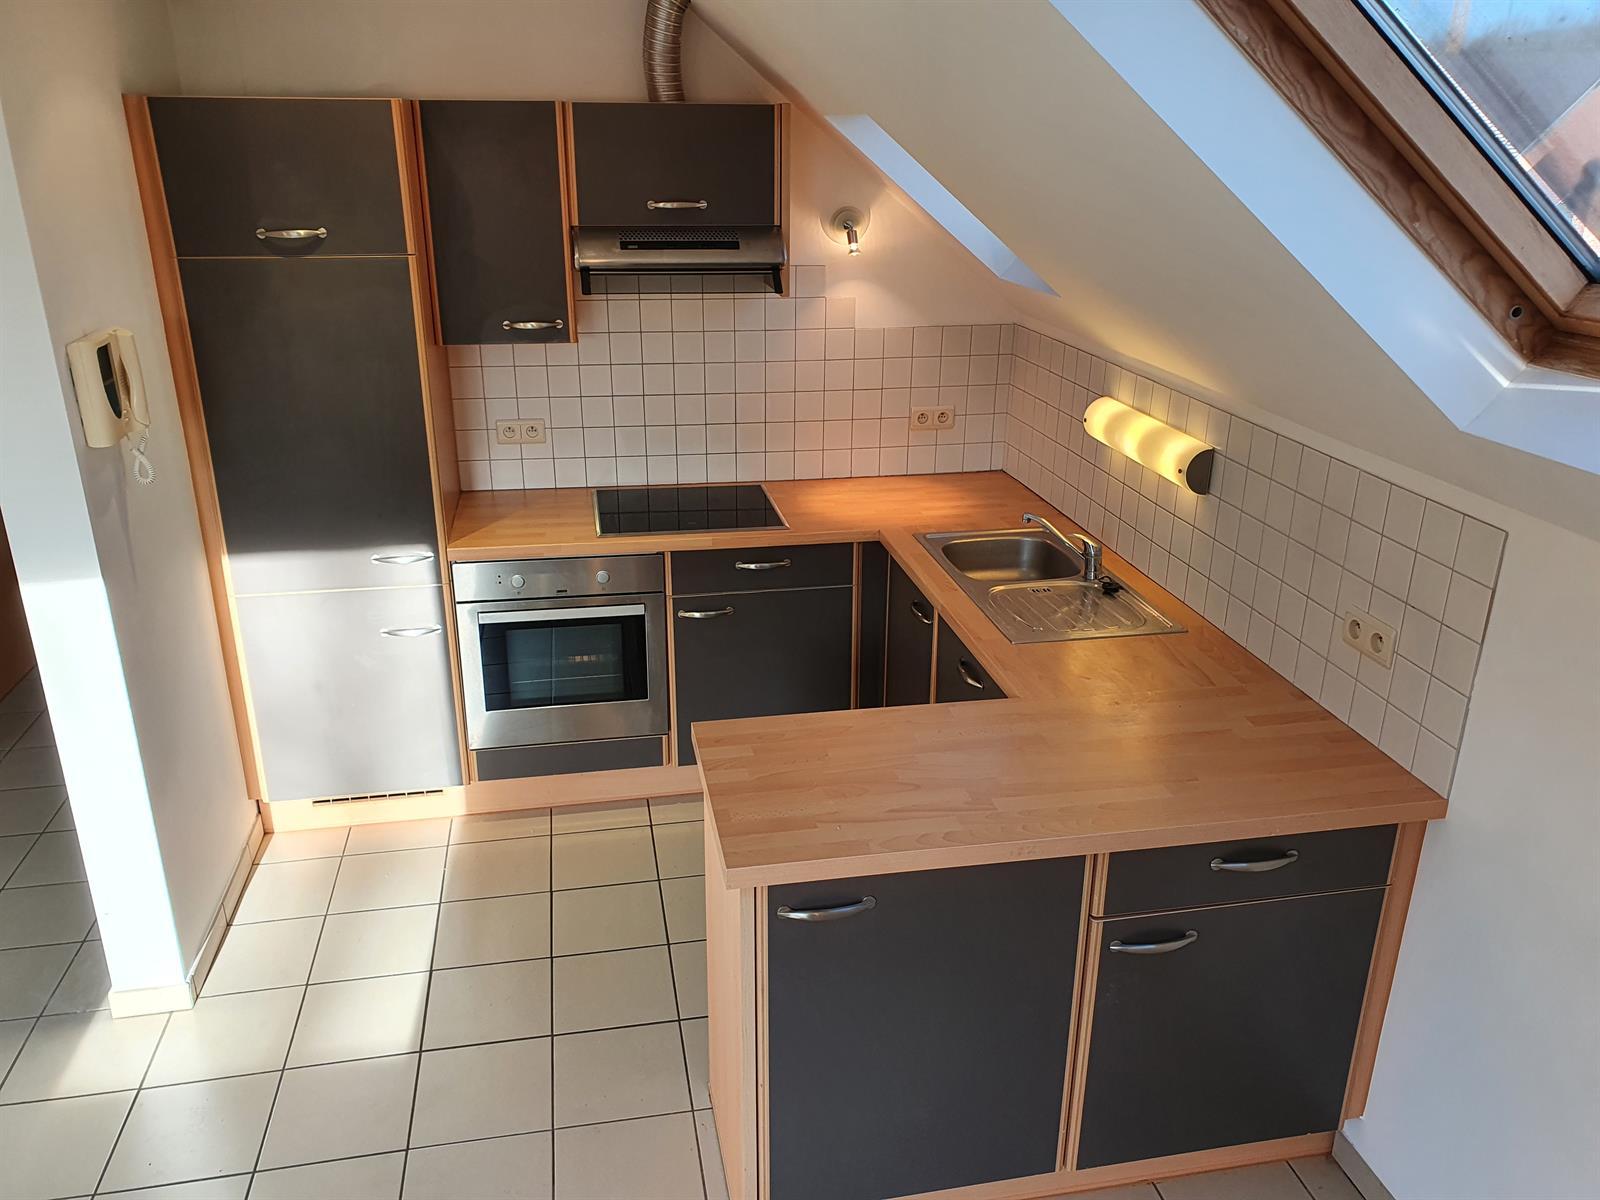 Appartement - Chaumont-Gistoux - #4226214-5